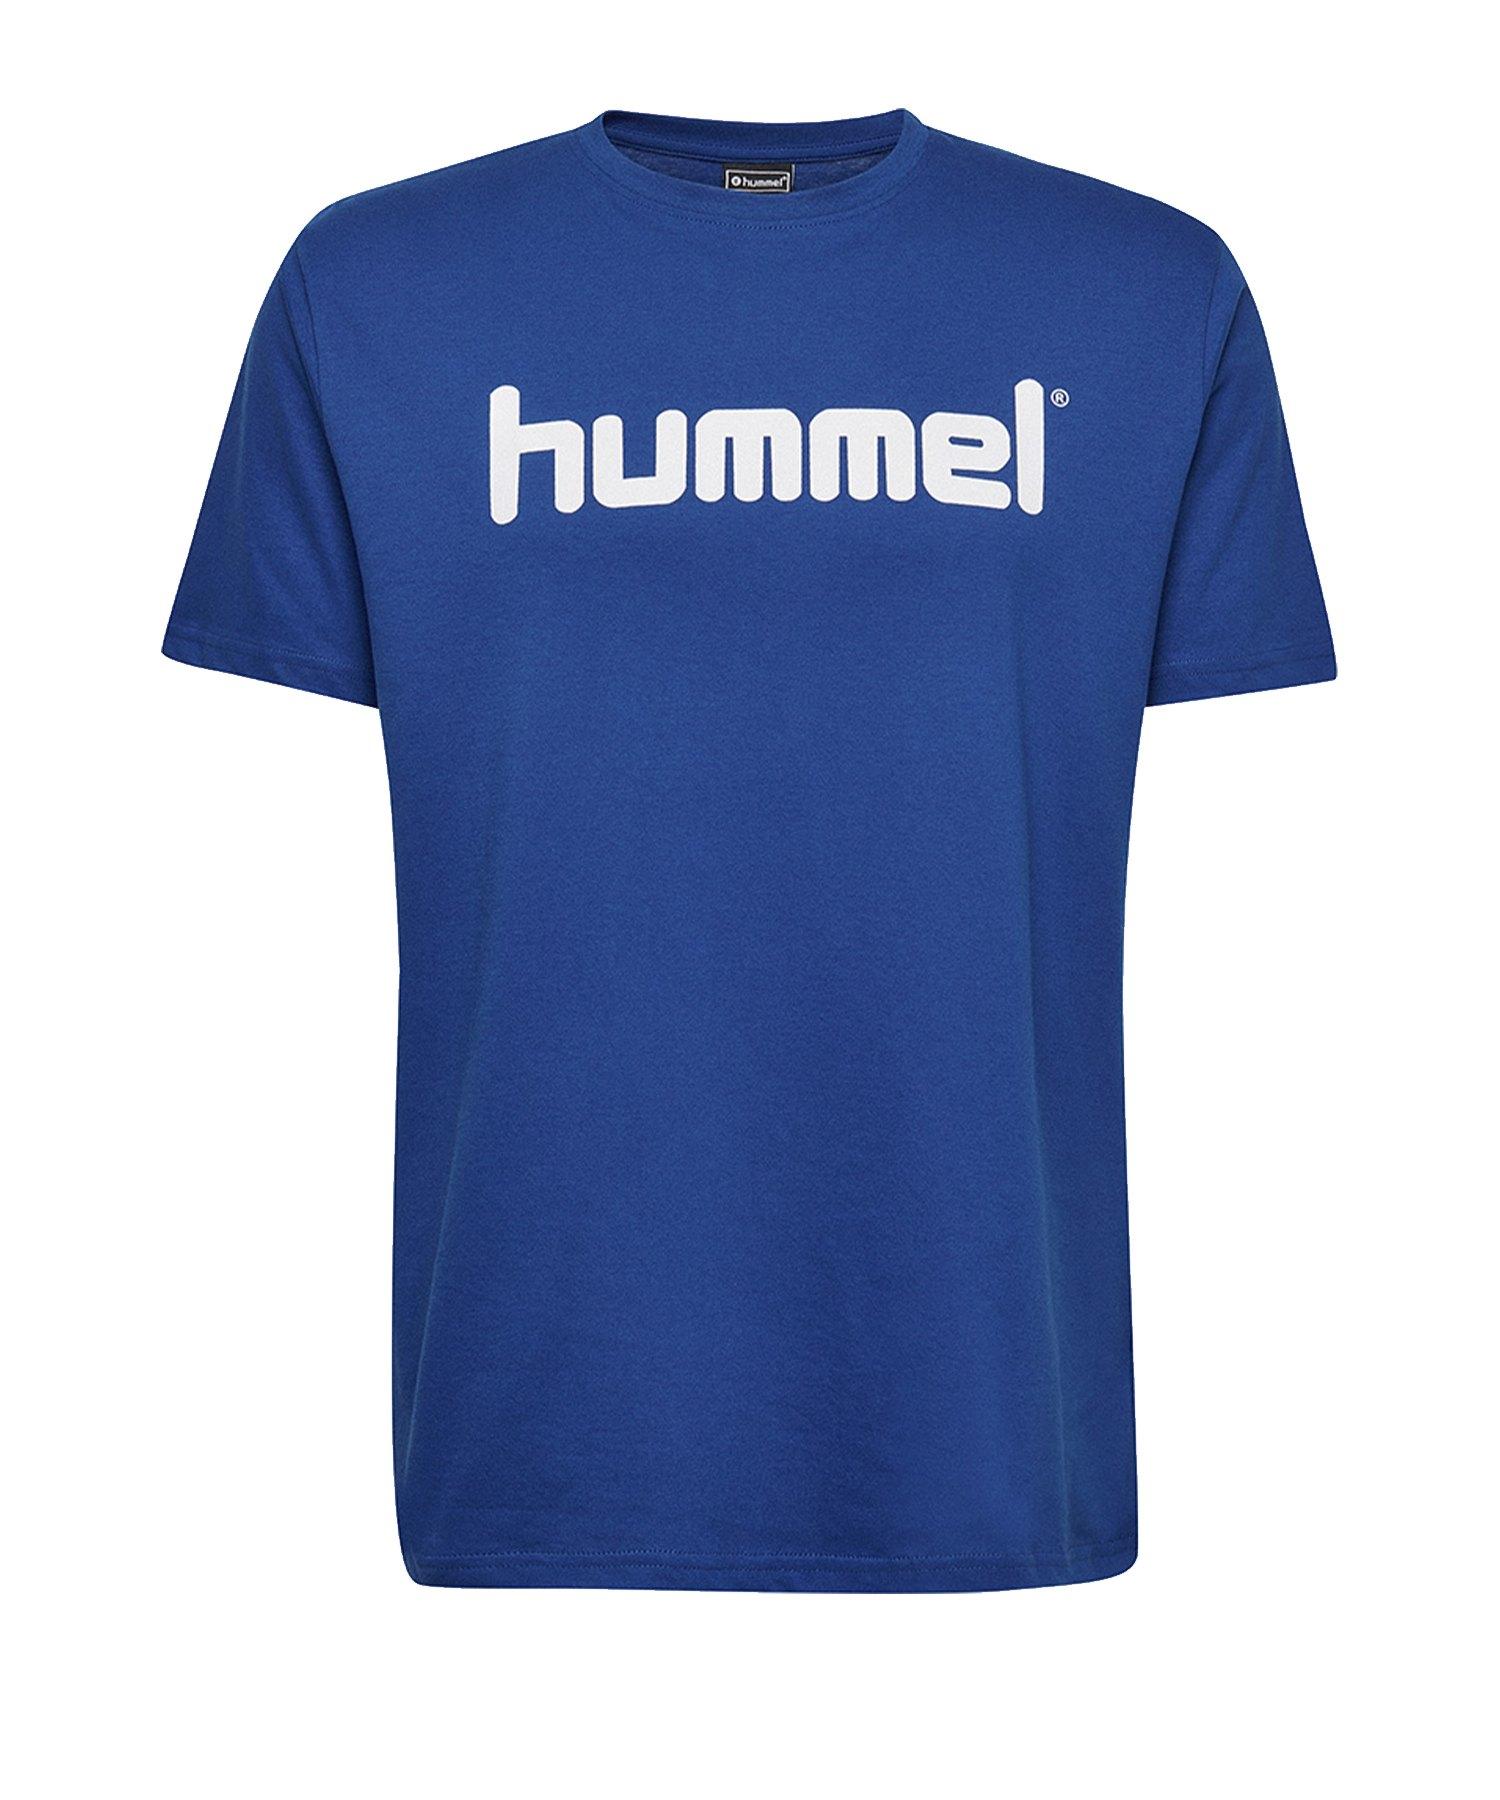 Hummel Cotton T-Shirt Logo Blau F7045 - Blau